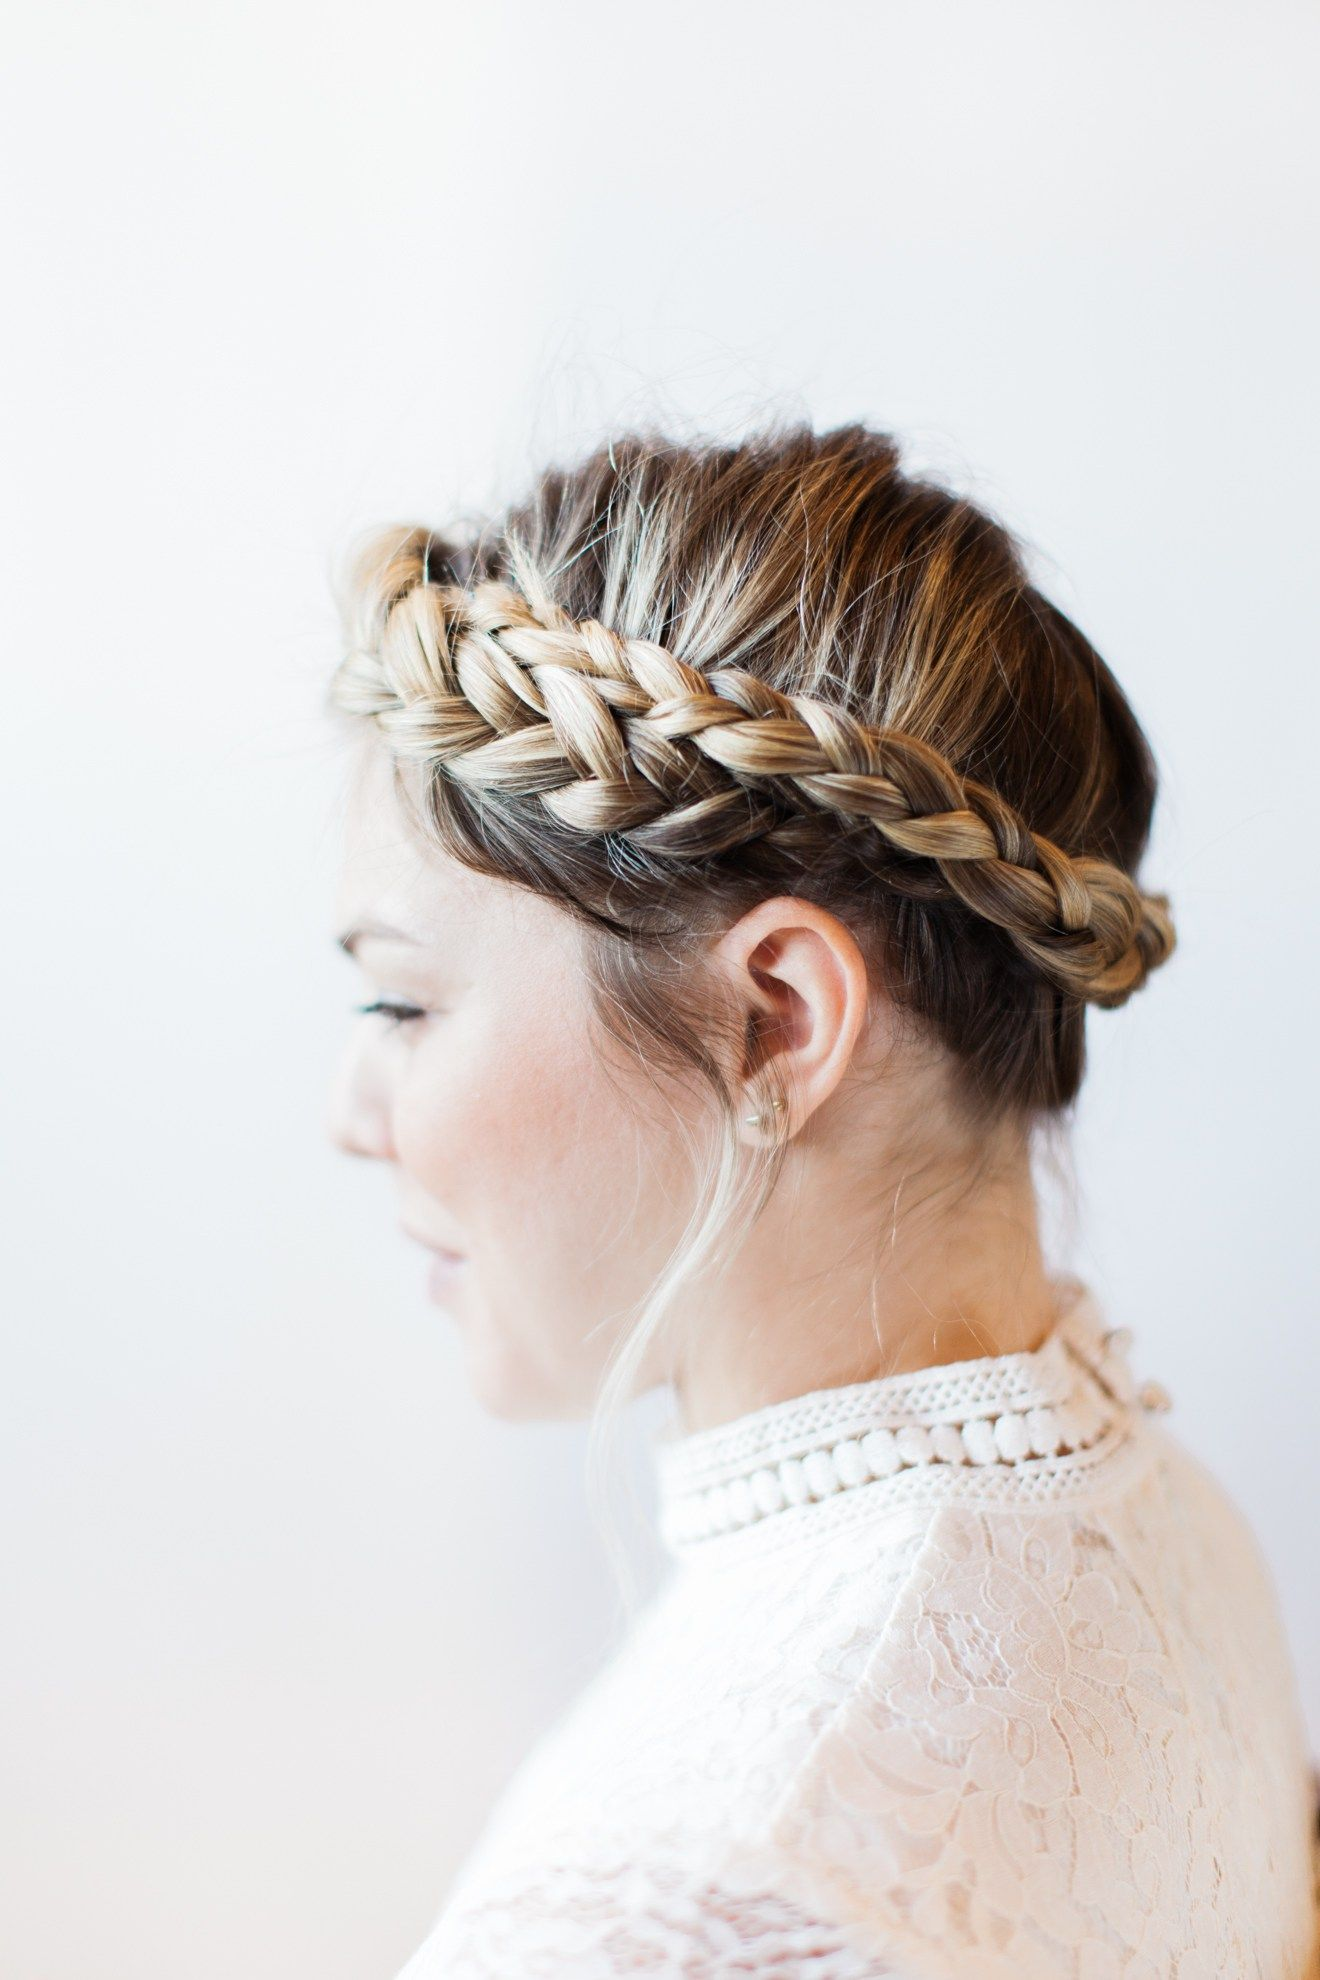 Pin by Jessie Cole on Cool Summer Barnets | Pinterest | Dutch braid ...